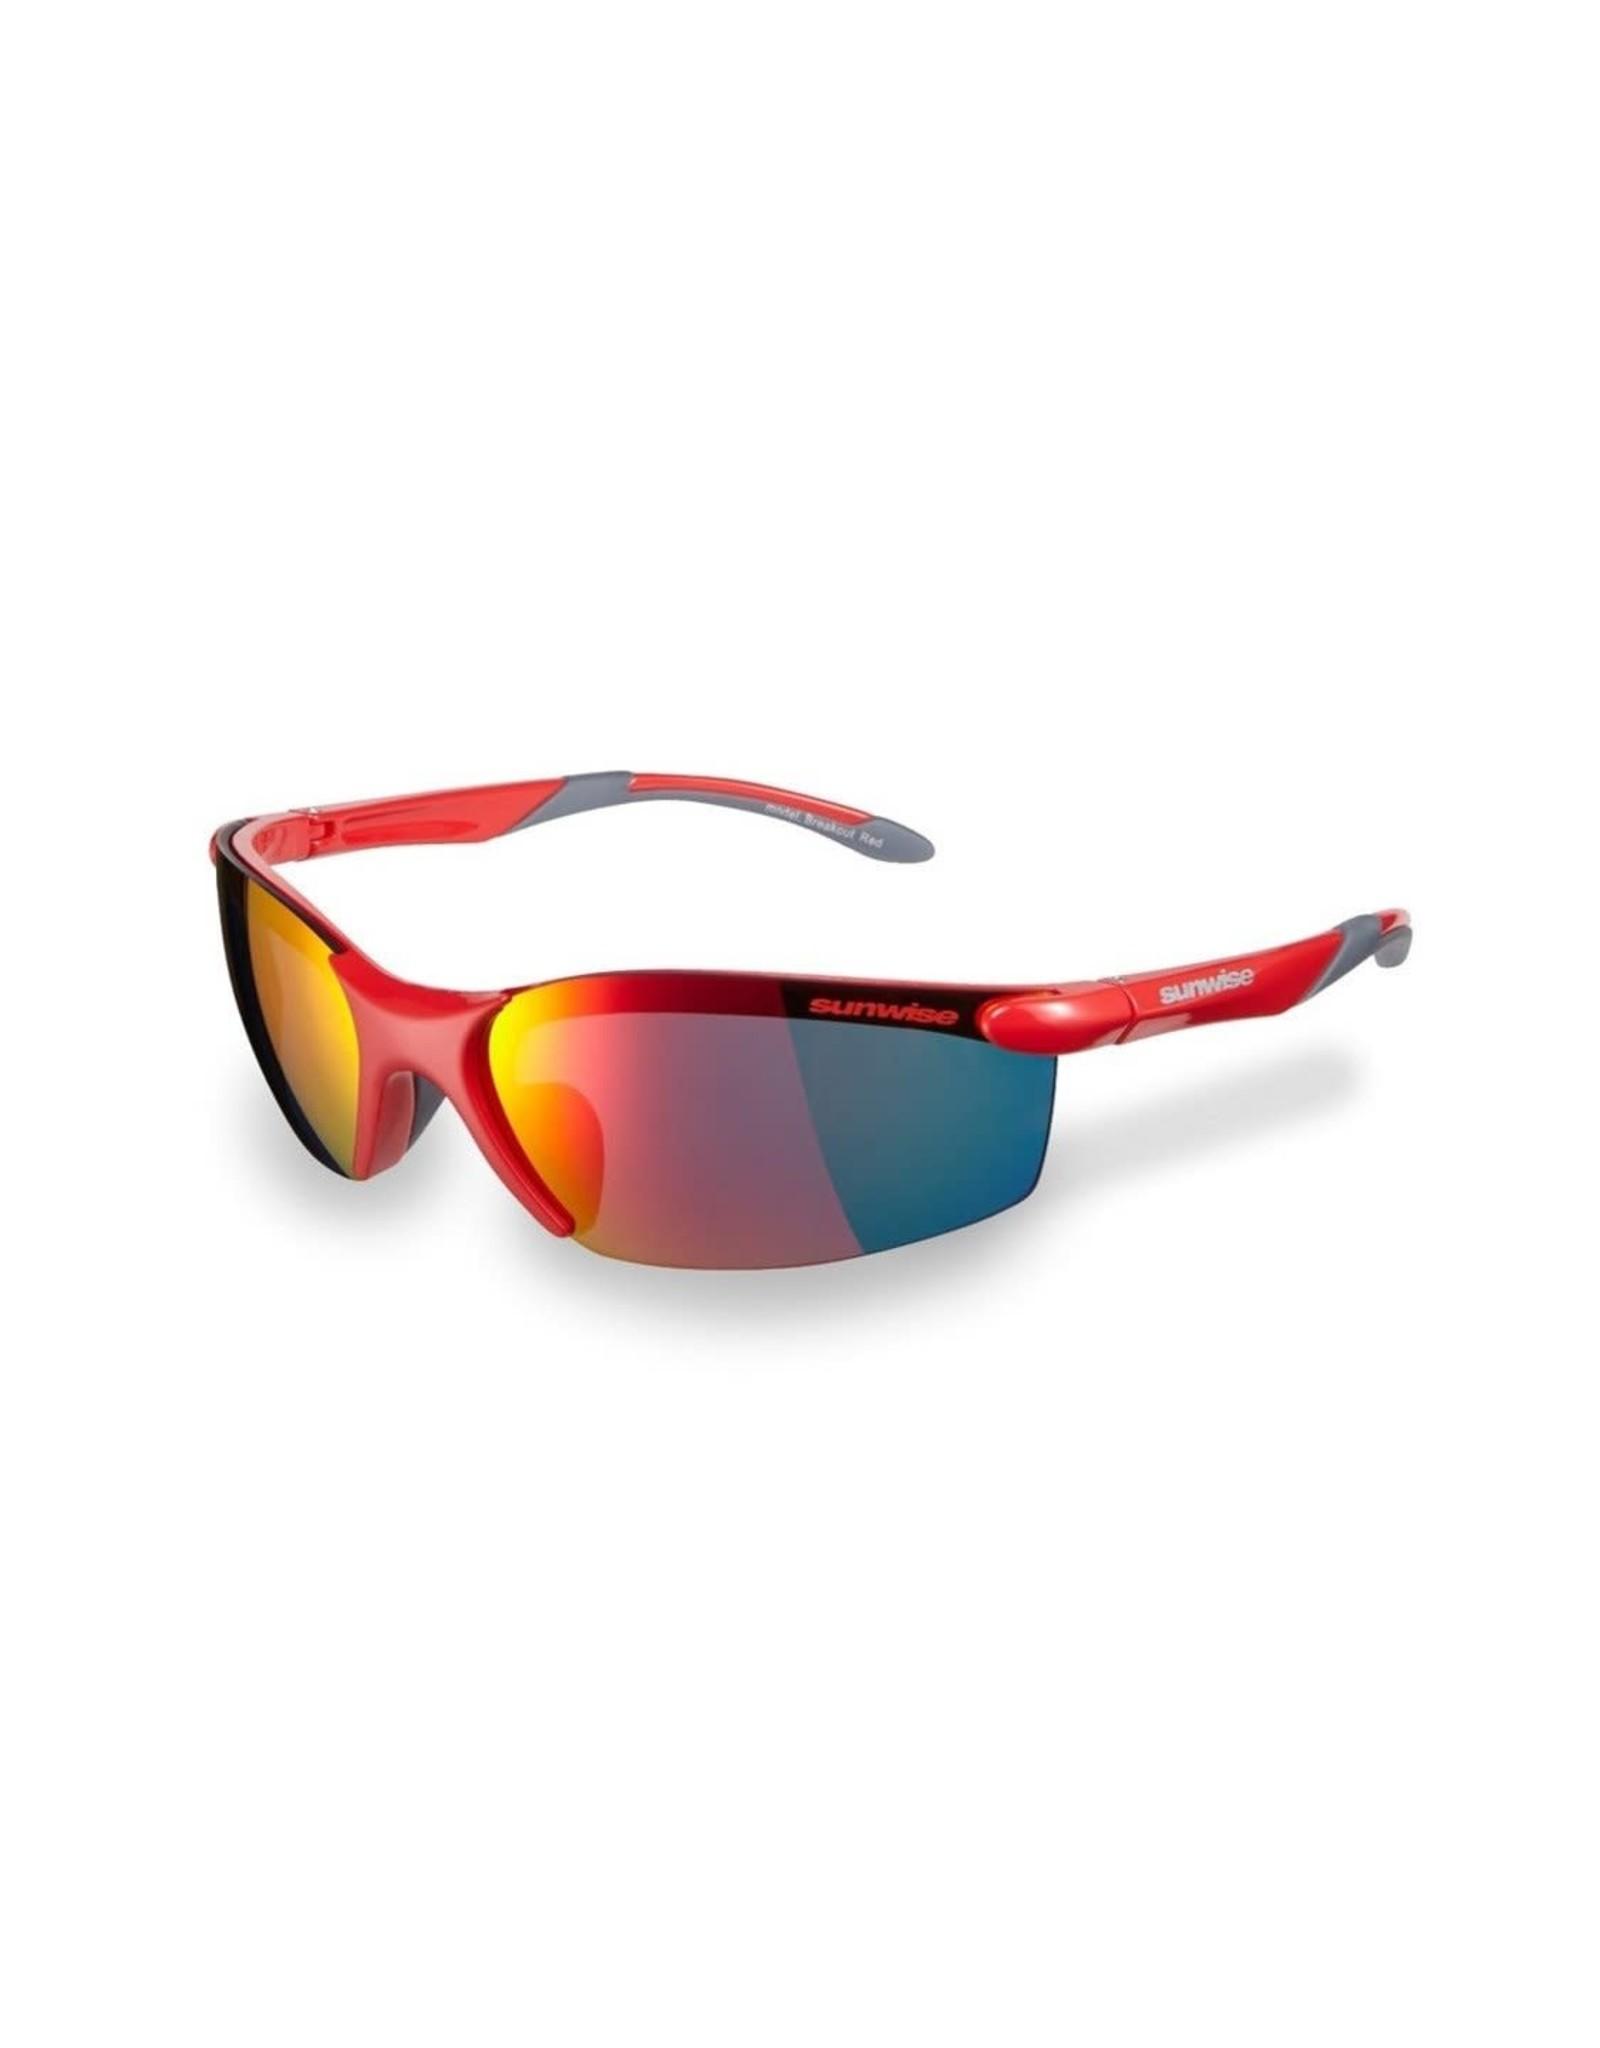 Sunwise Breakout Cycling Sunglasses